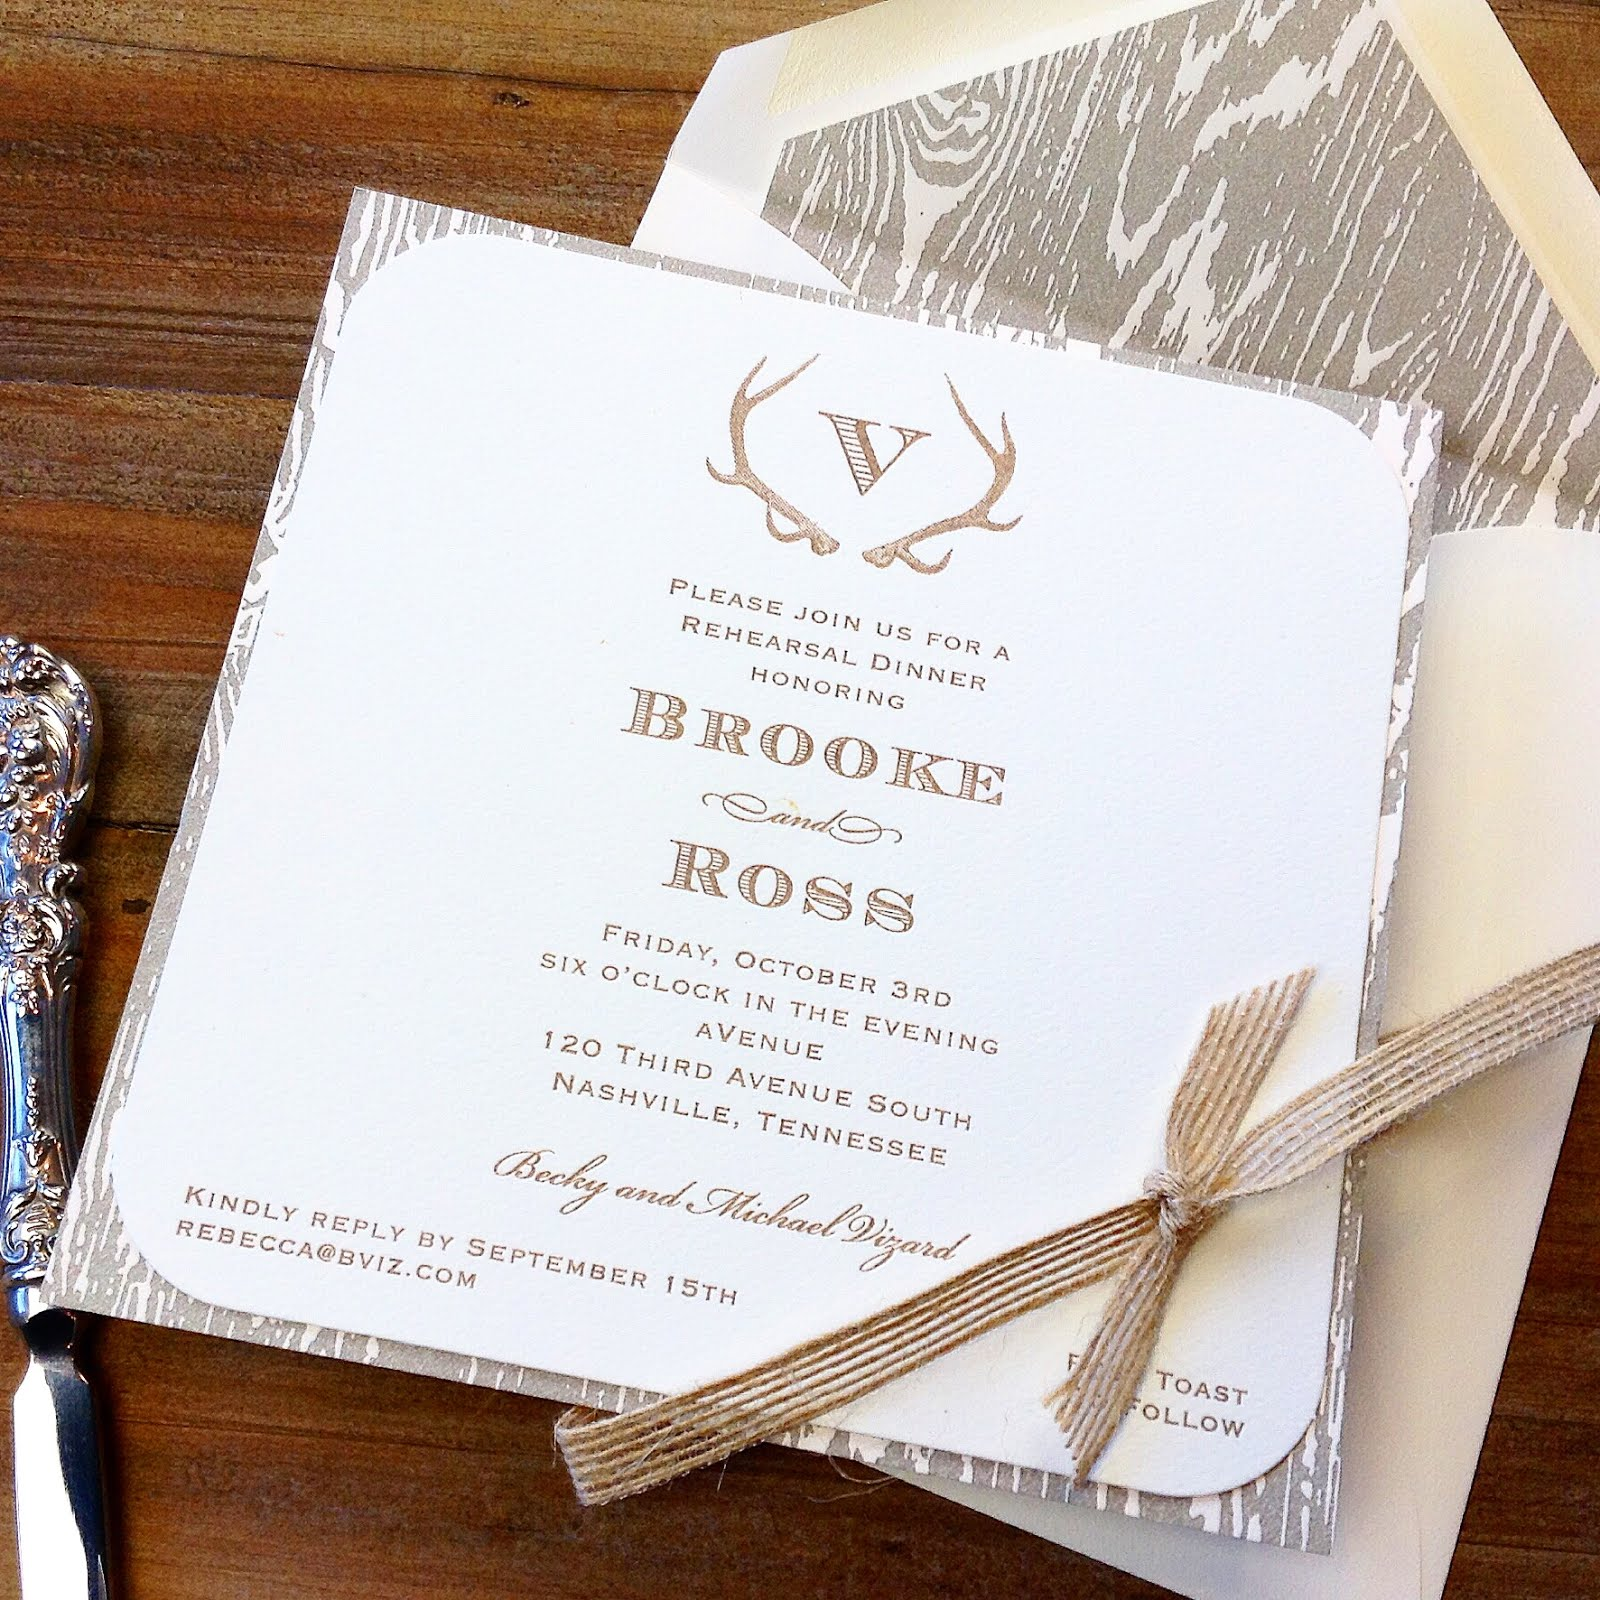 Brooke Kimbro and Ross Vizard Wedding Rehearsal Dinner Invitation ...